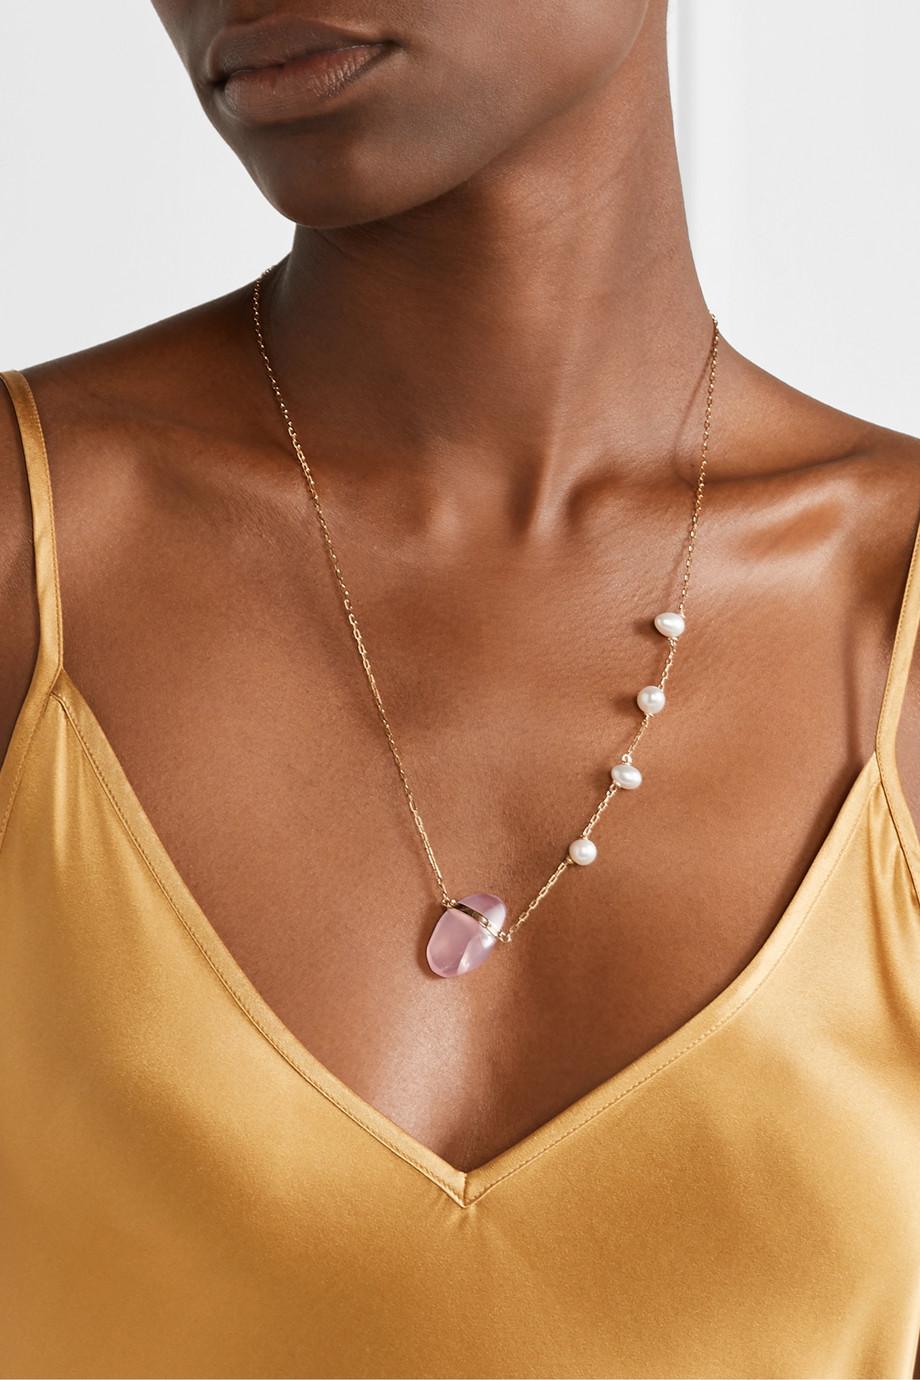 Harris Zhu 14-karat gold, quartz and pearl necklace